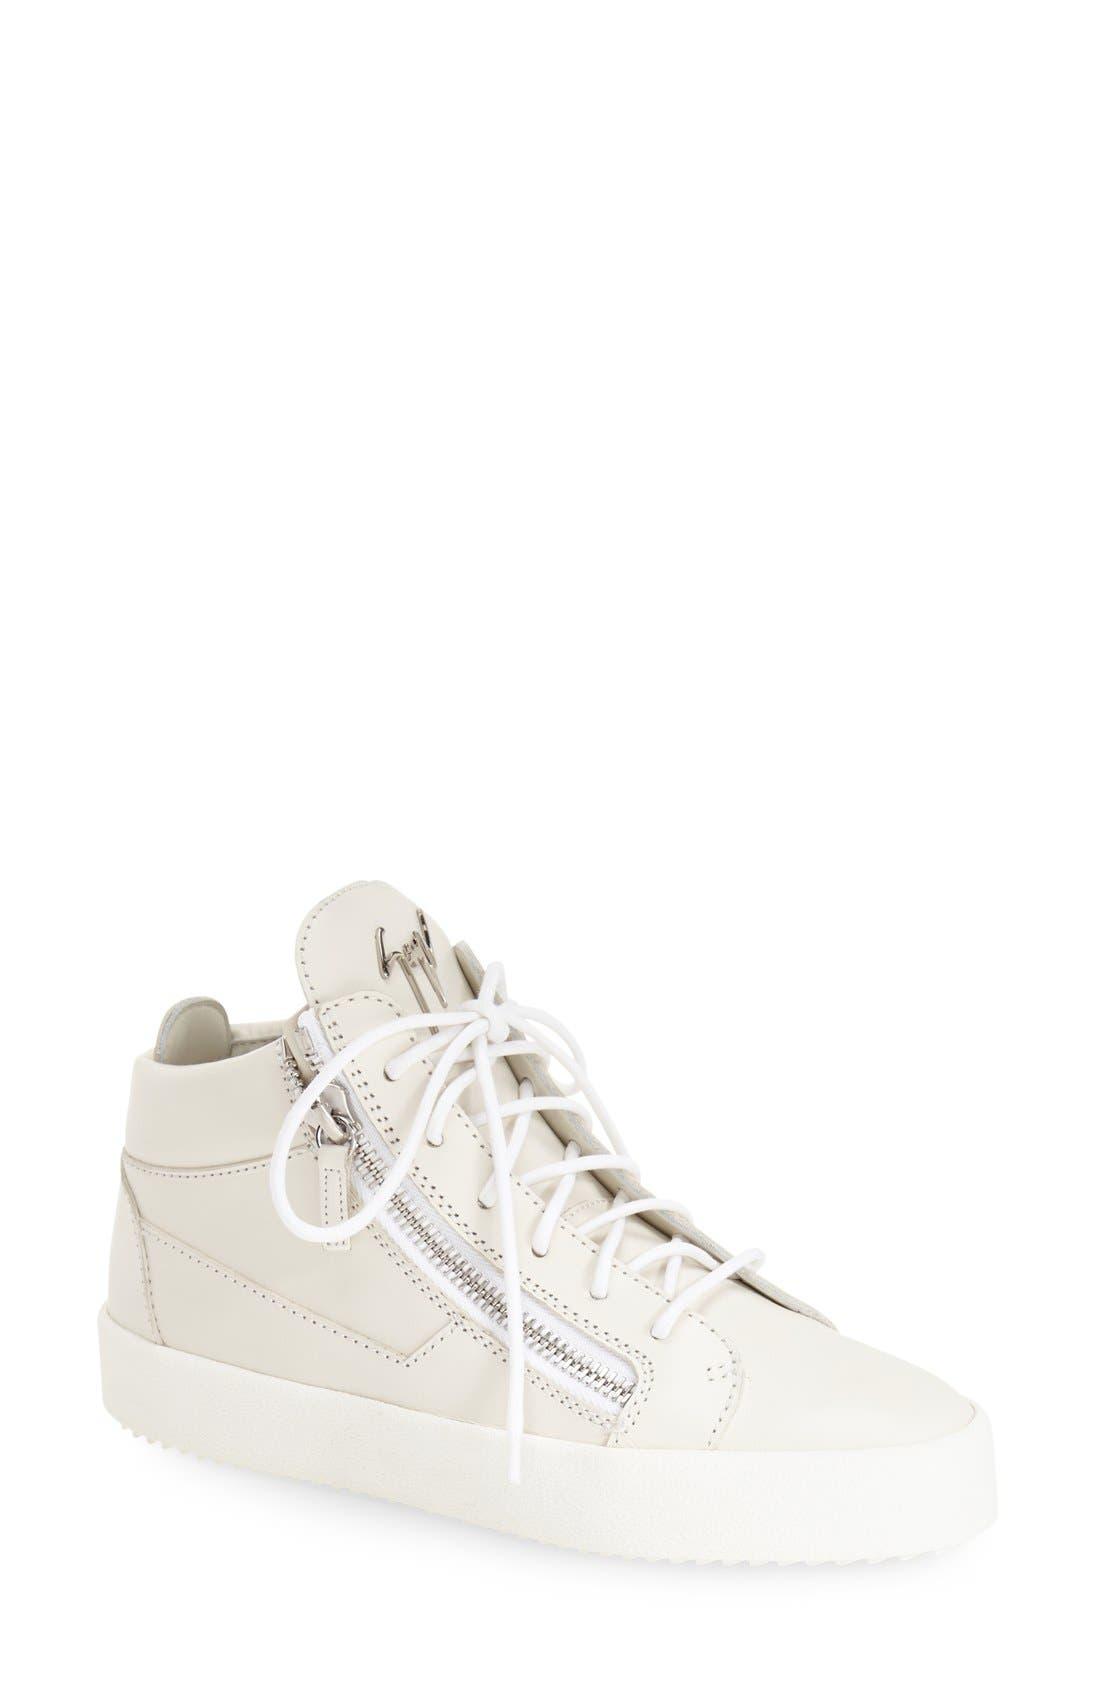 High Top Sneaker,                             Main thumbnail 1, color,                             020